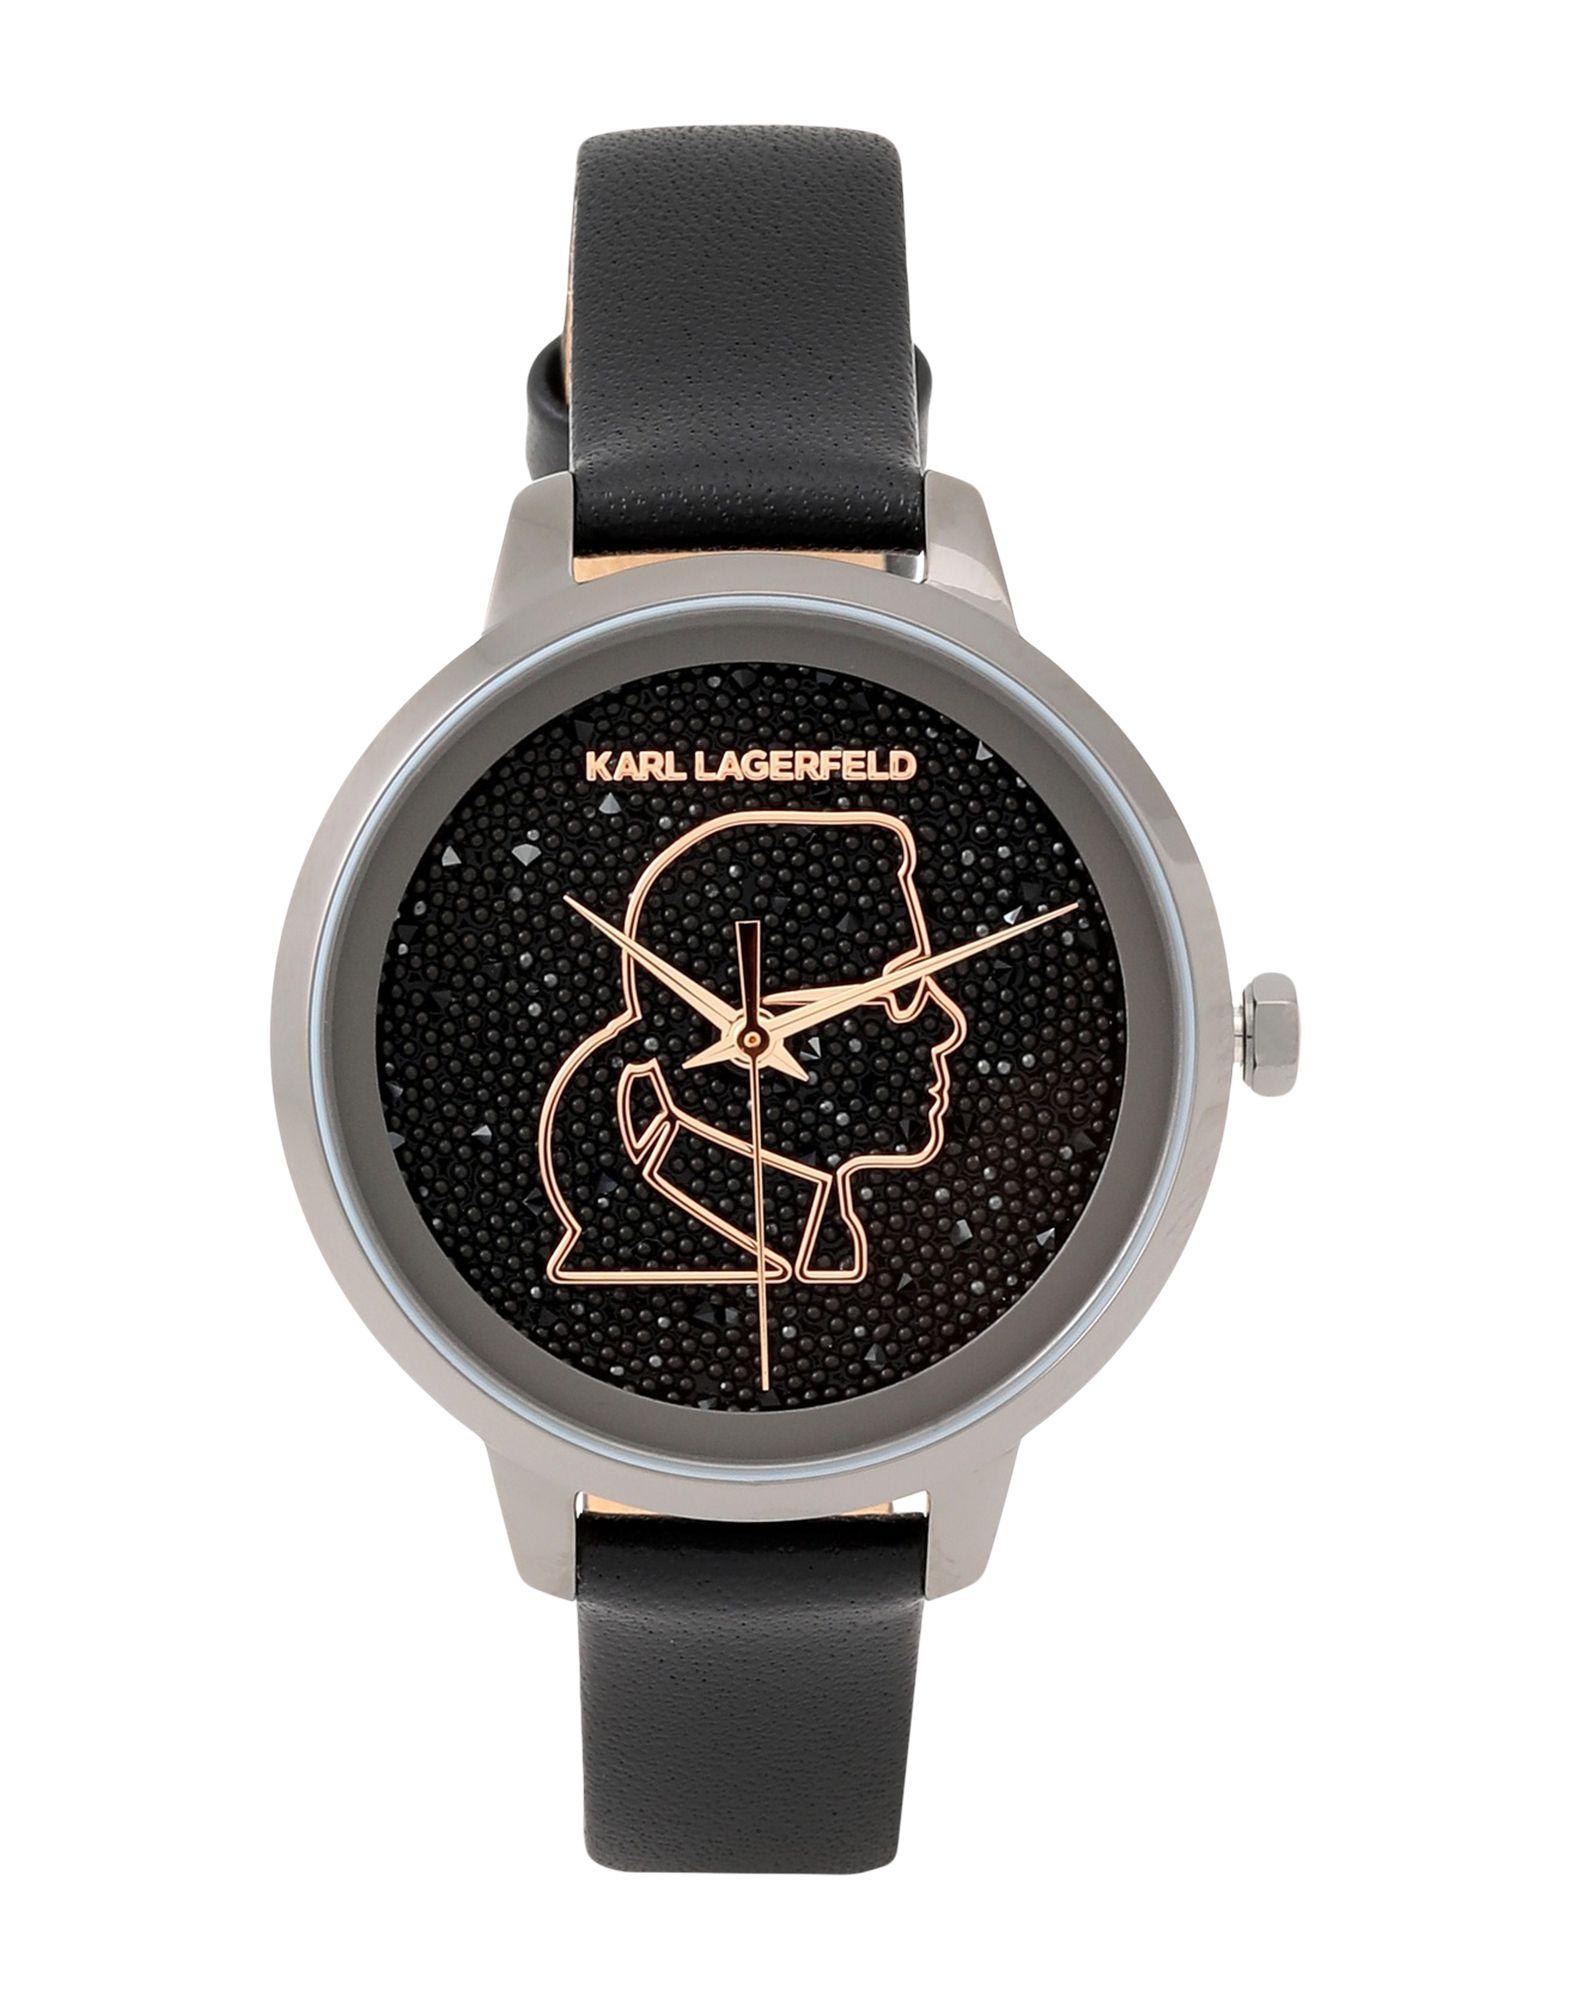 KARL LAGERFELD Wrist watches - Item 58050412